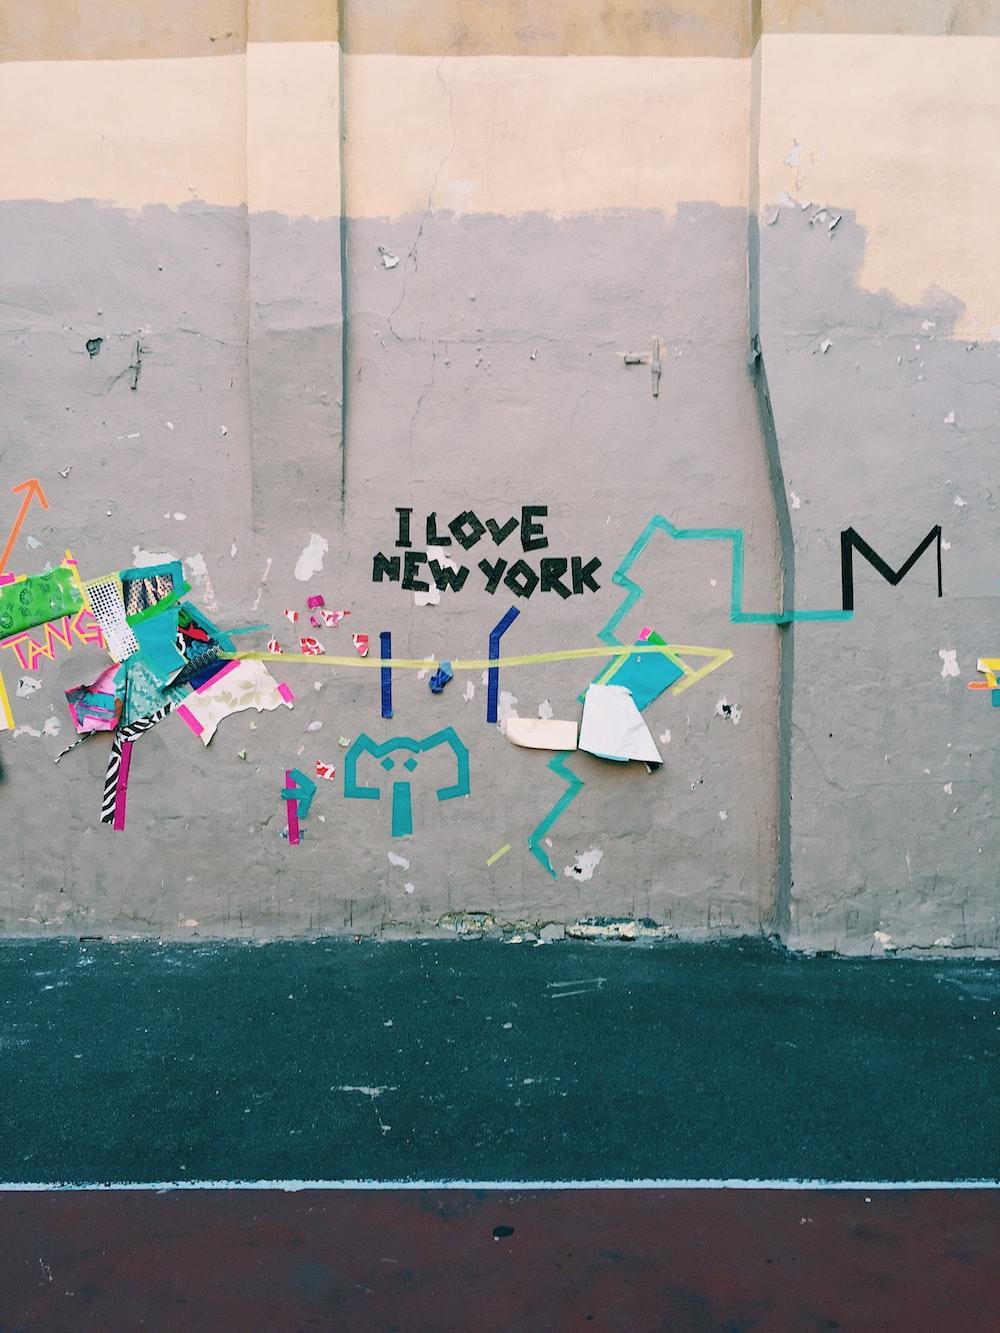 i love New York printed on wall